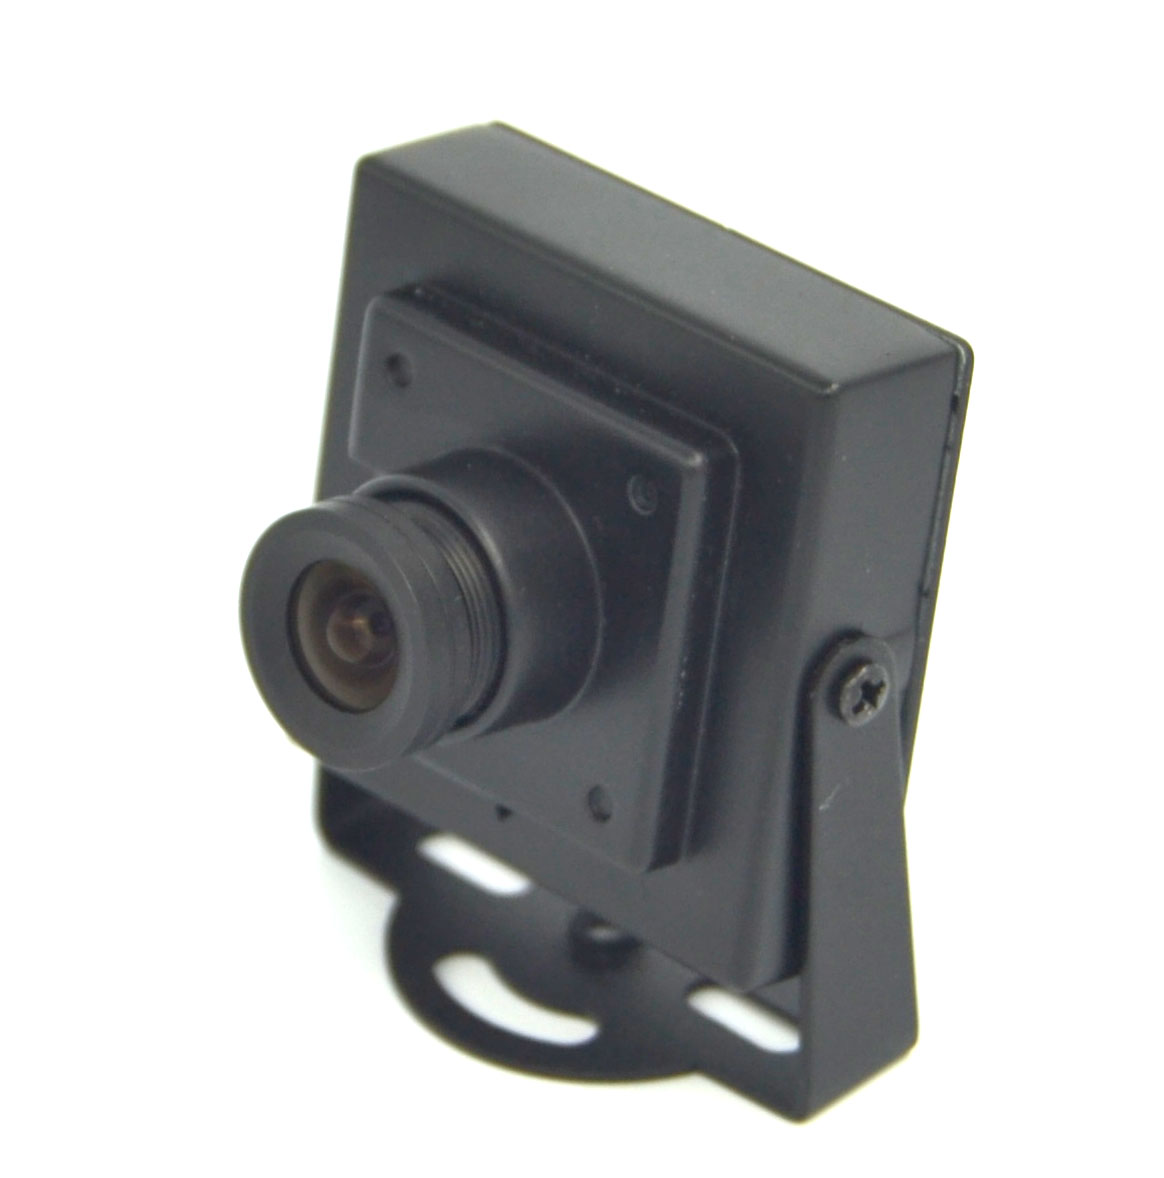 2017 Promotion Frame Value 2 Lipo Servo Tamiya 1 3 Ntsc Mini Ccd Fpv Camera For